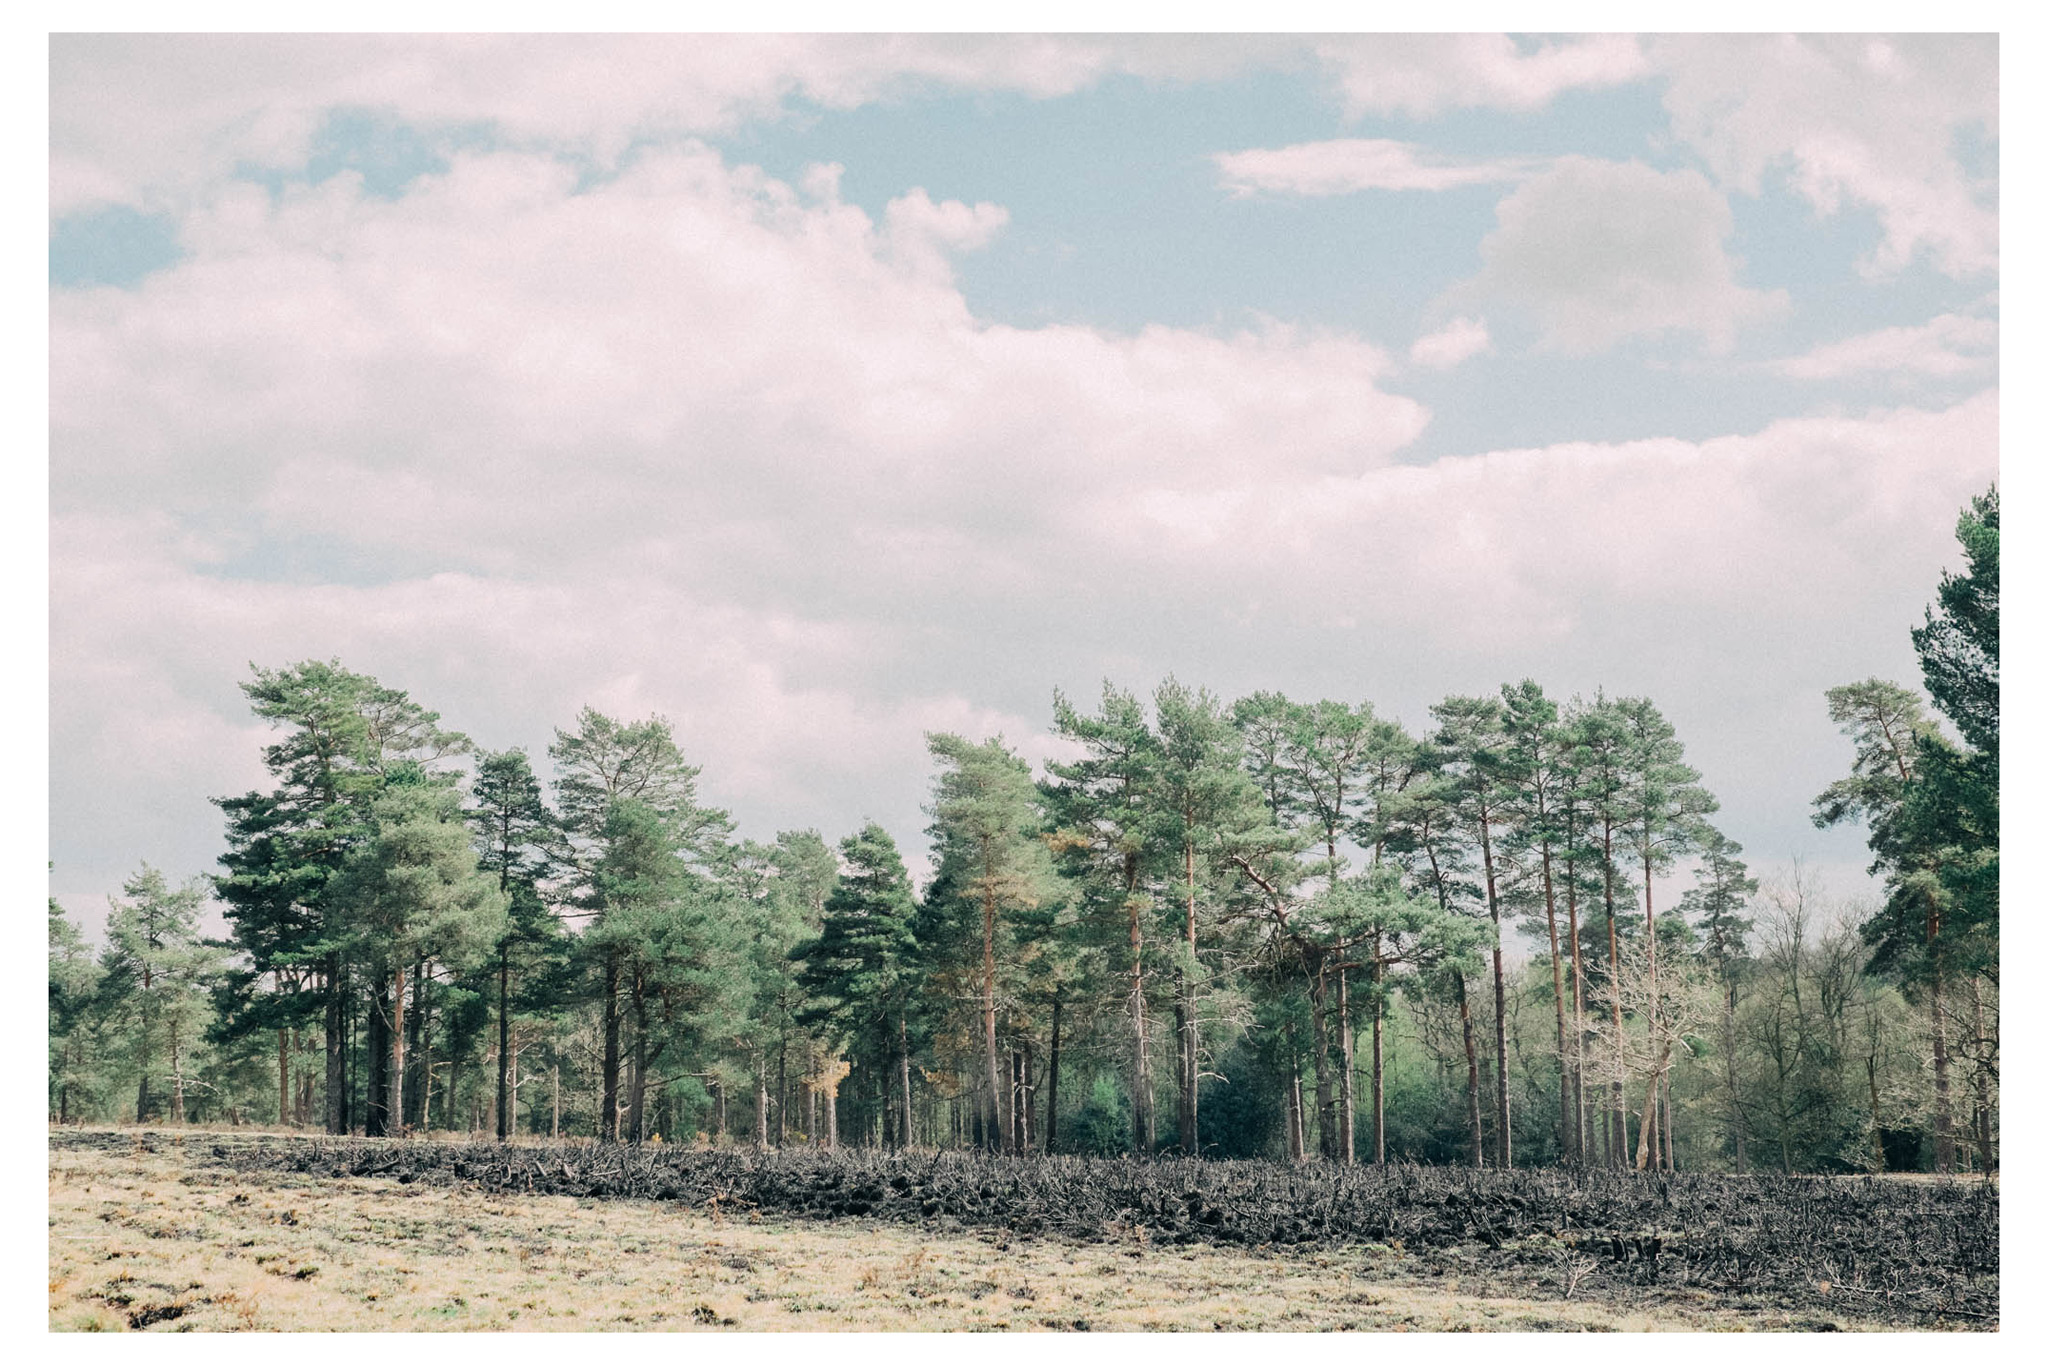 ashdownforest-0149.jpg